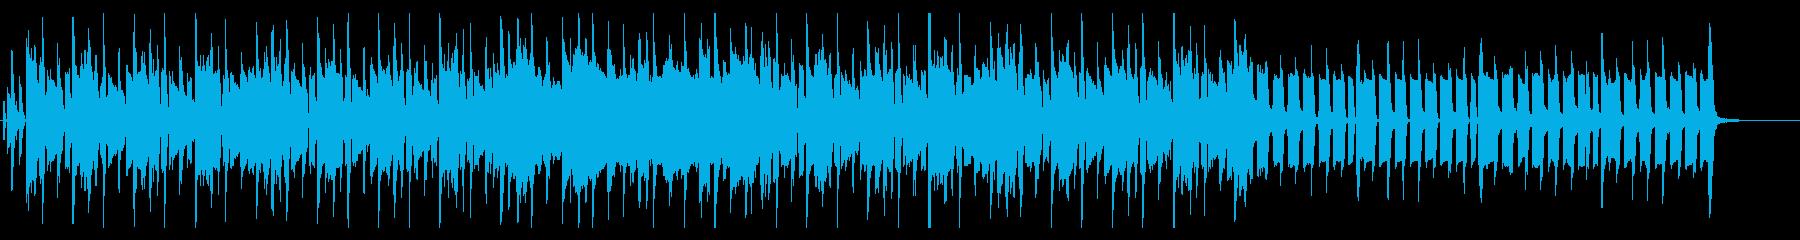 texture5の再生済みの波形